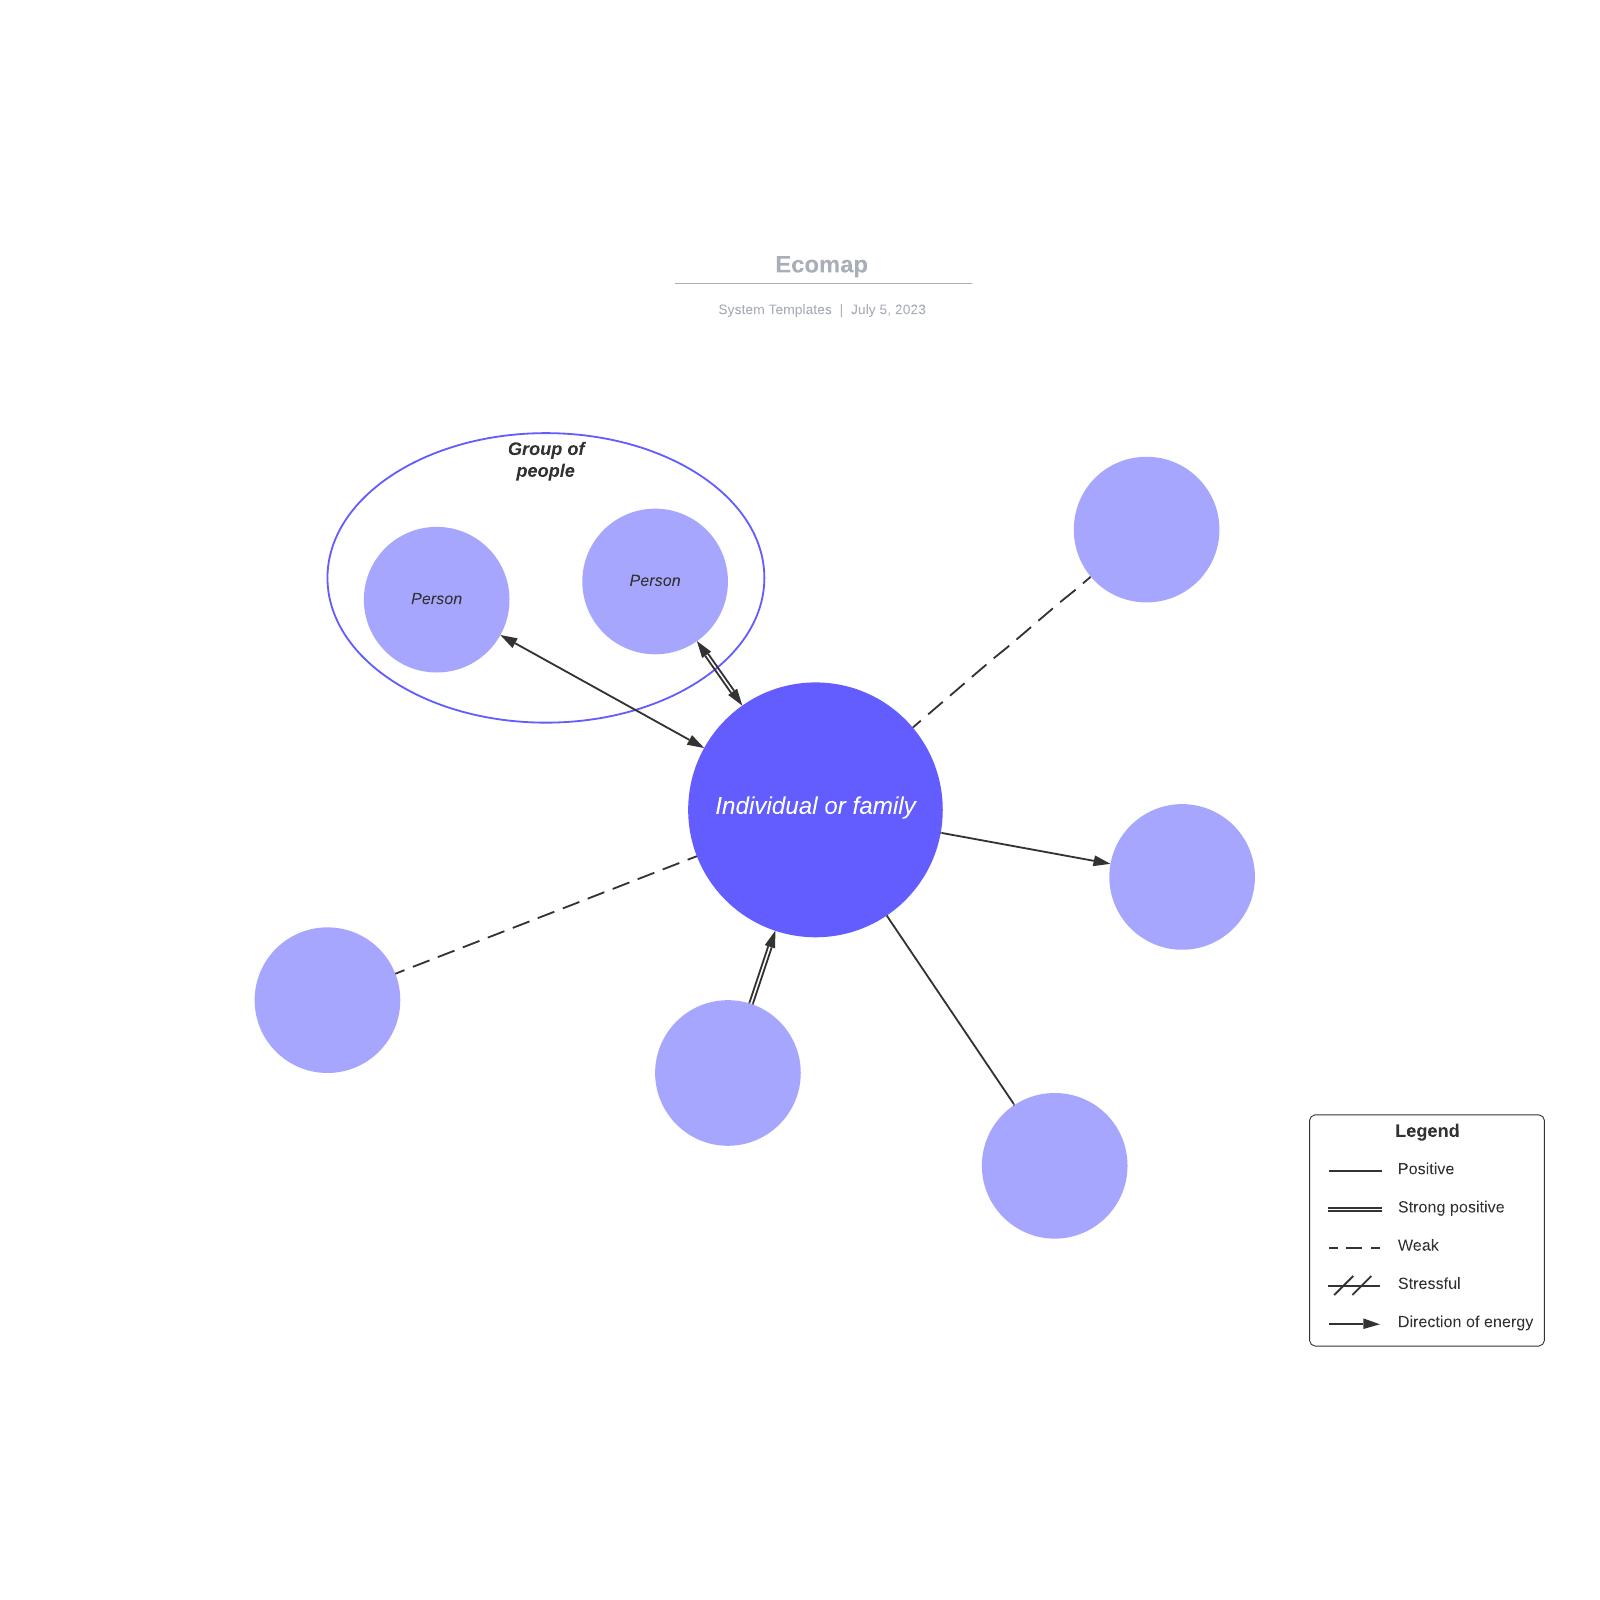 Ecomap